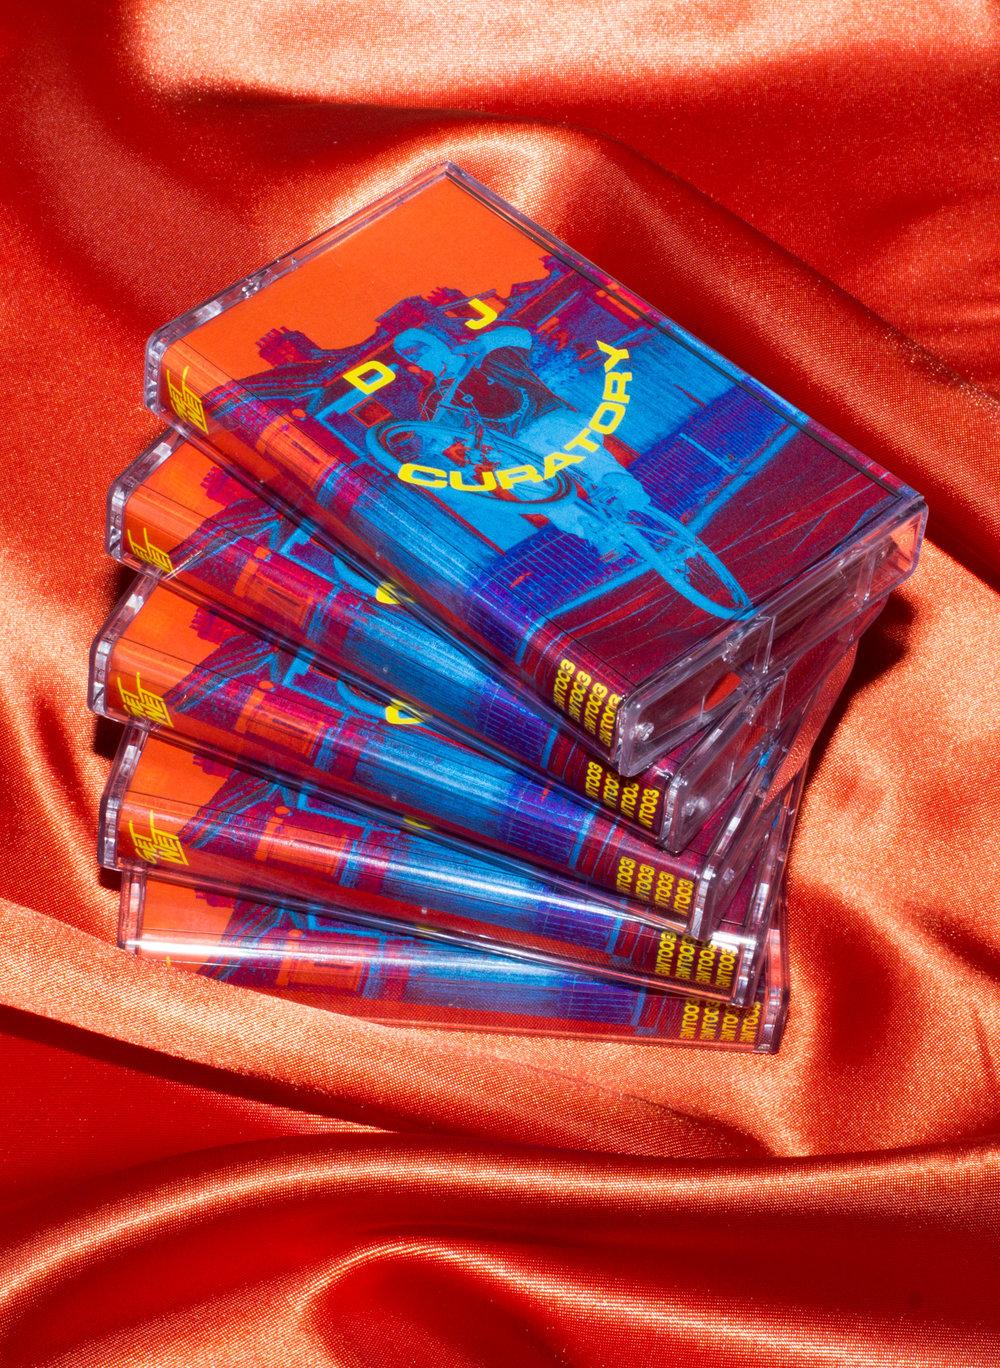 dj-curatory-tape-1-rfm-2x3-facebook.jpg